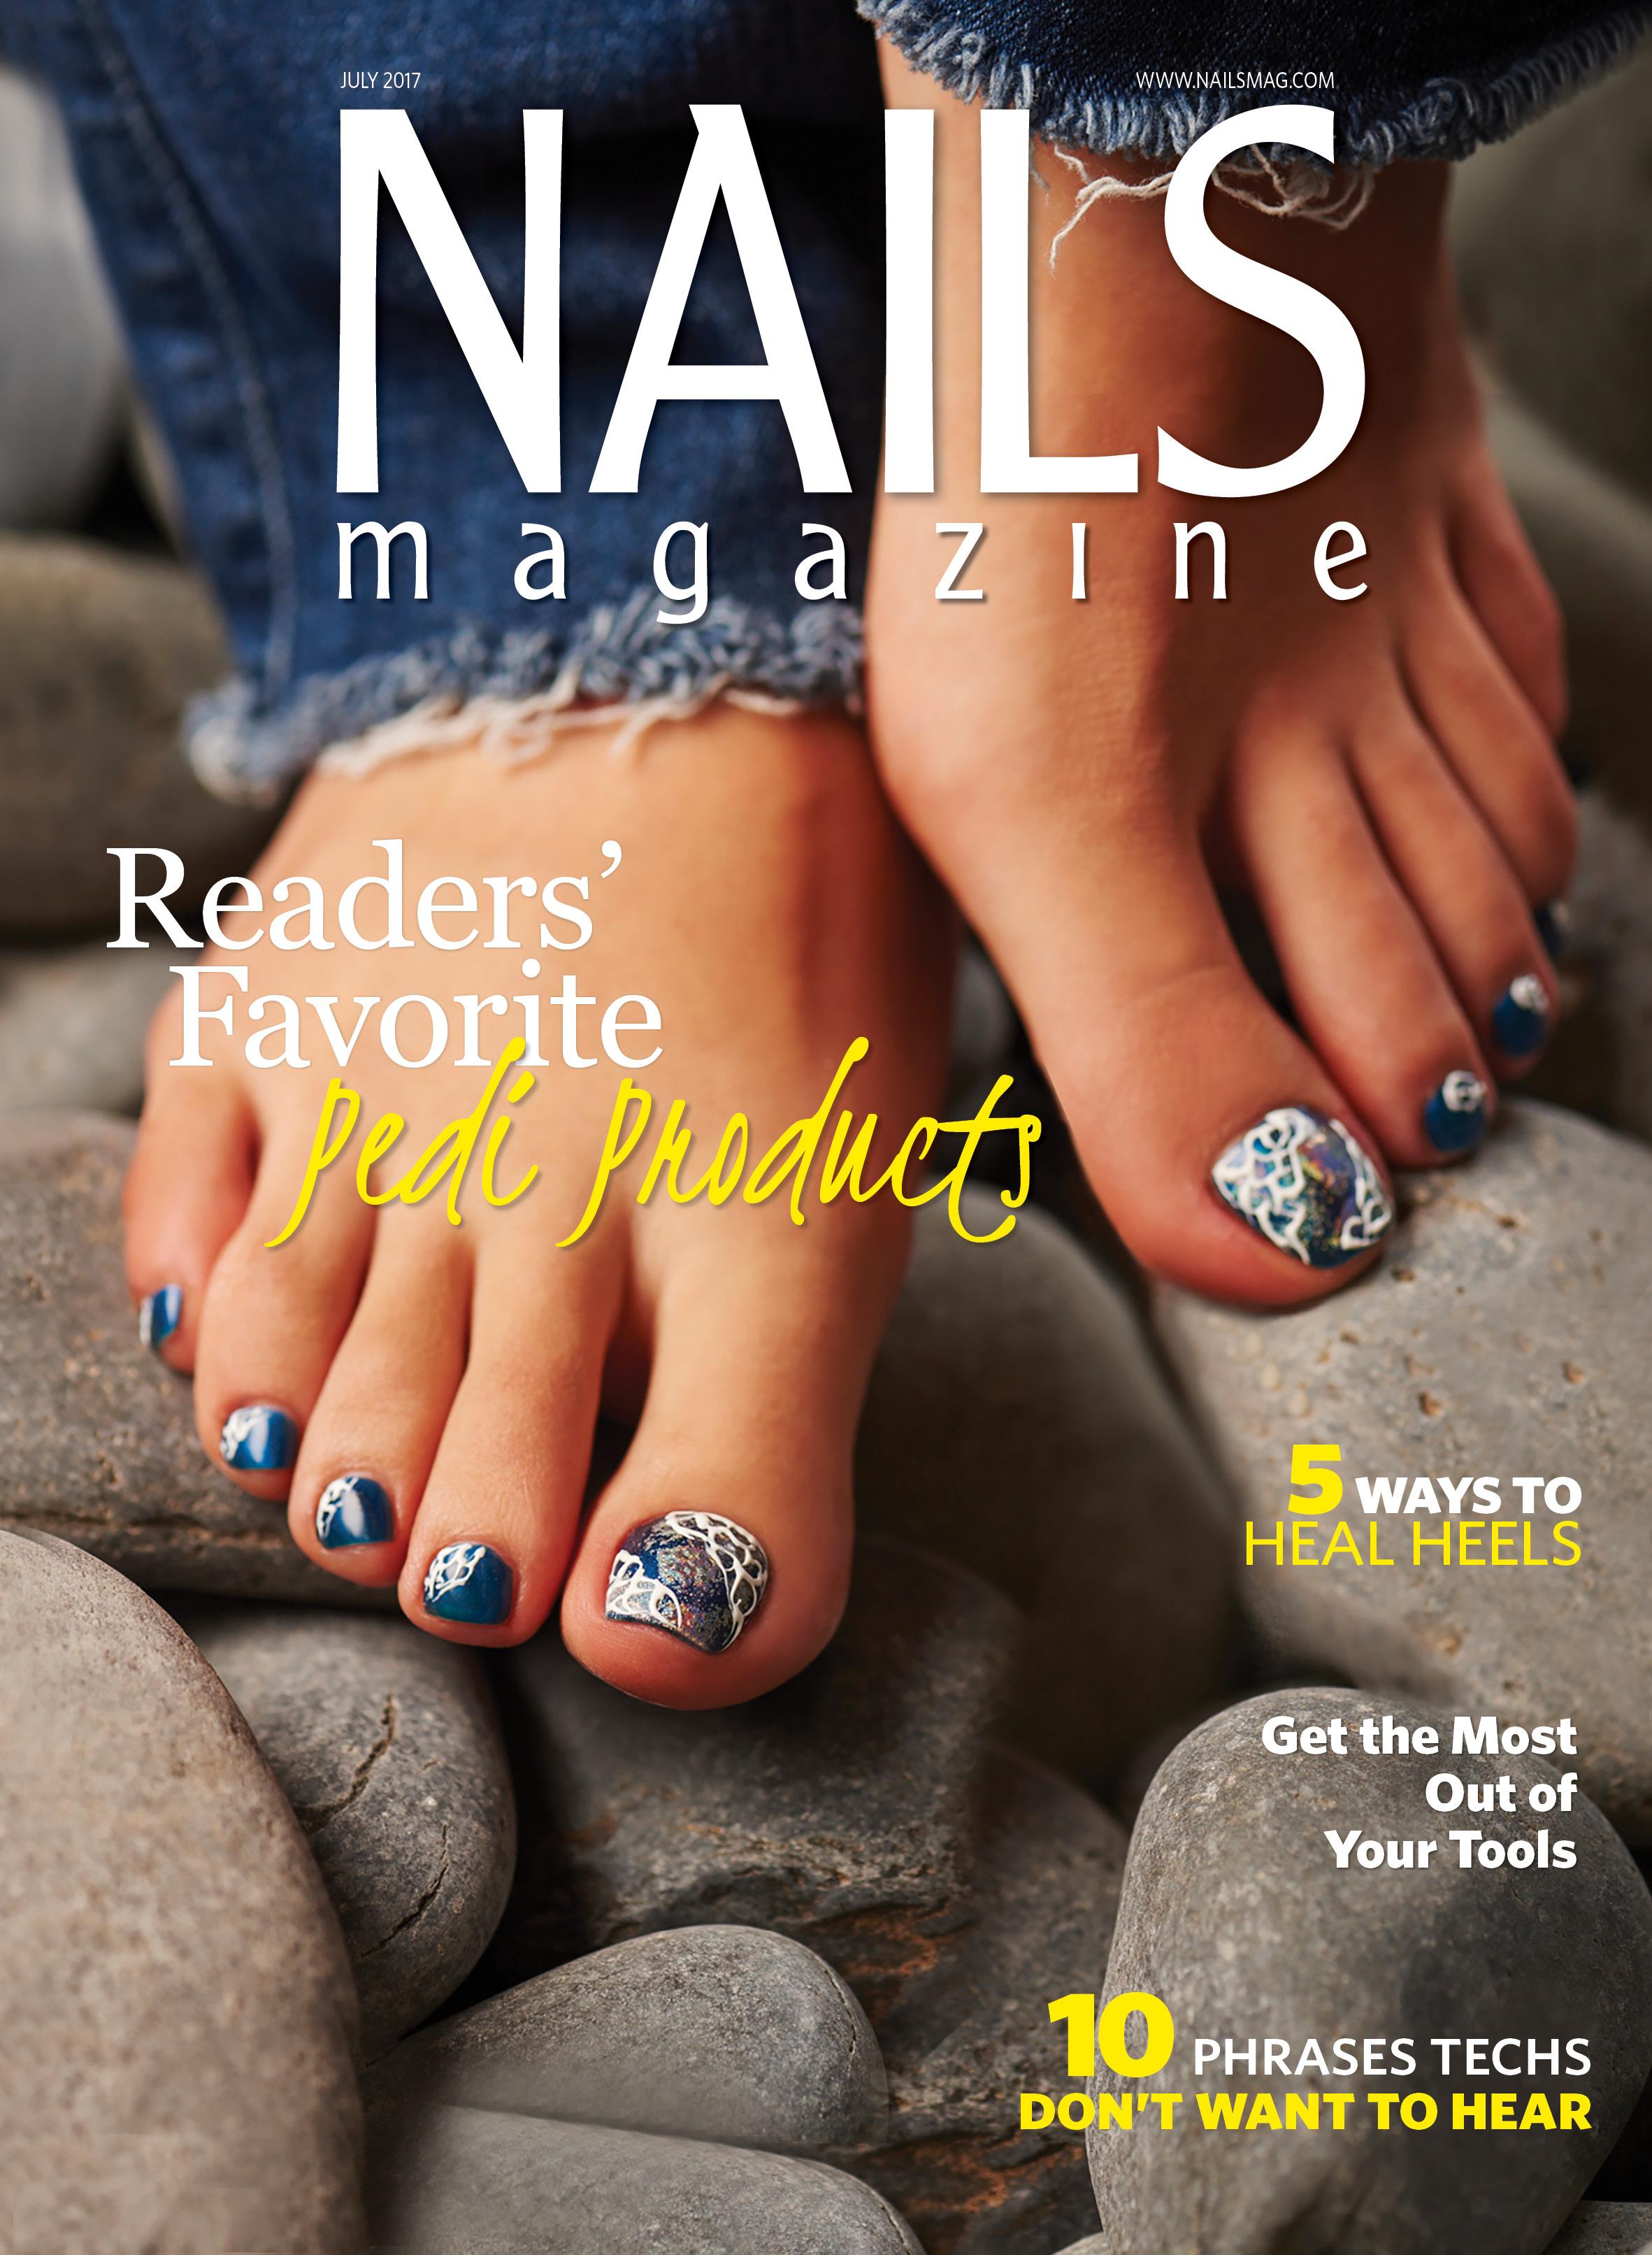 NAILS Magazine | July 2017 Issue